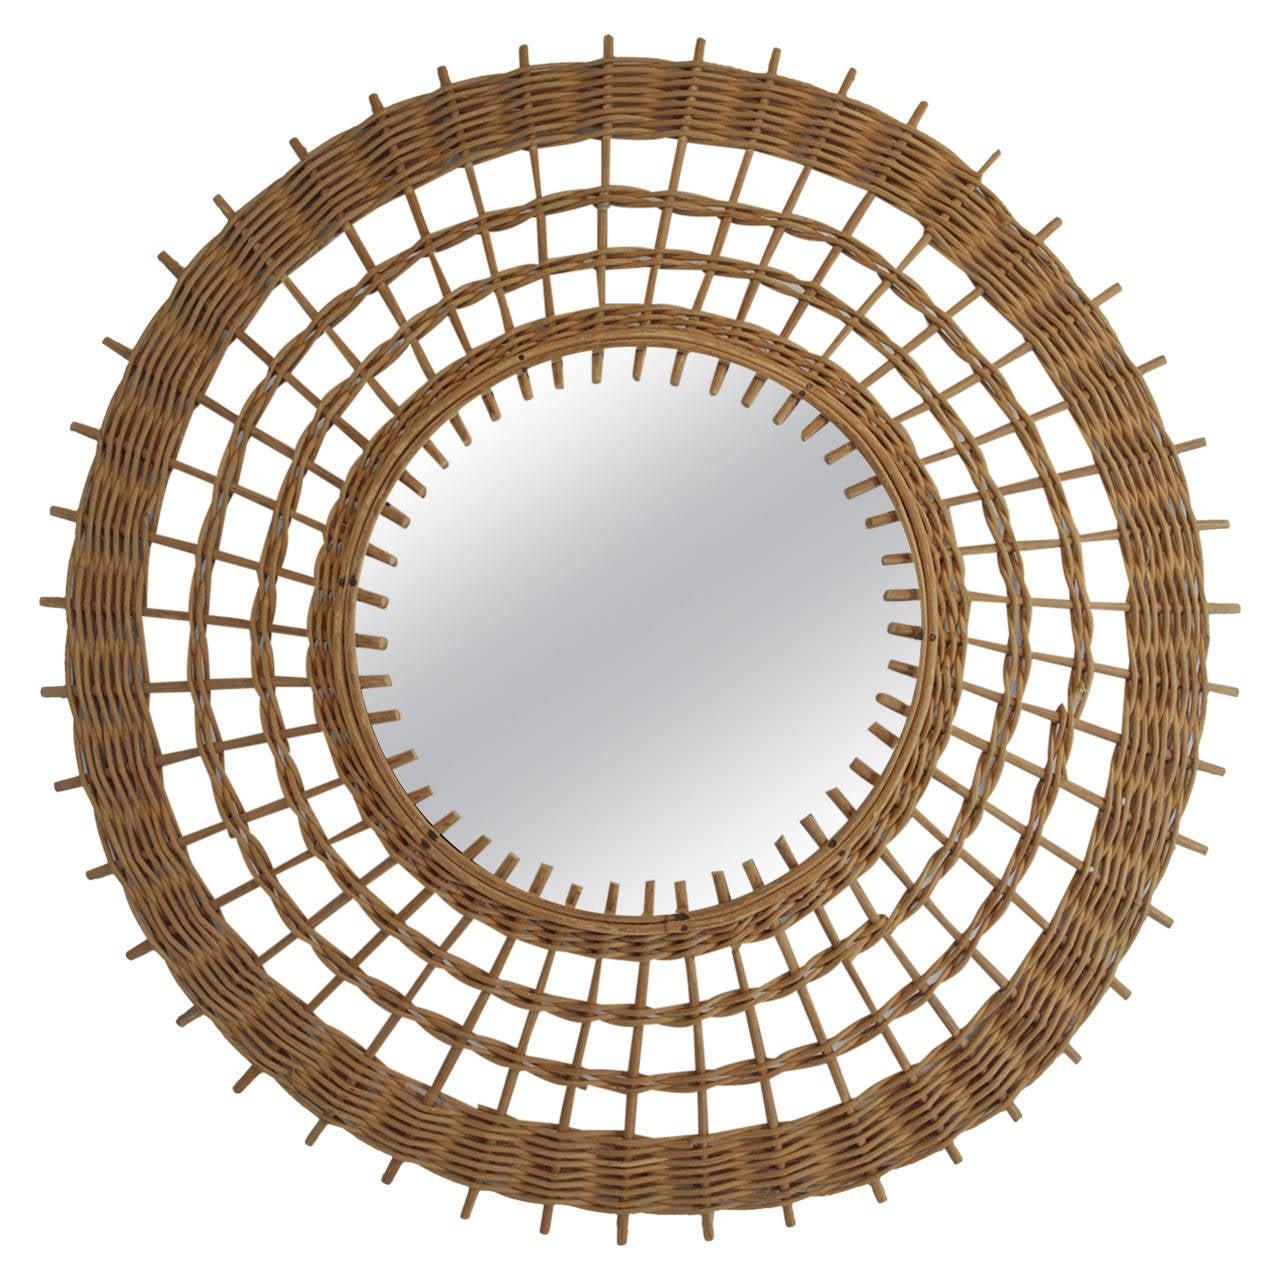 Wicker sunburst mirror at 1stdibs for Sunburst mirror